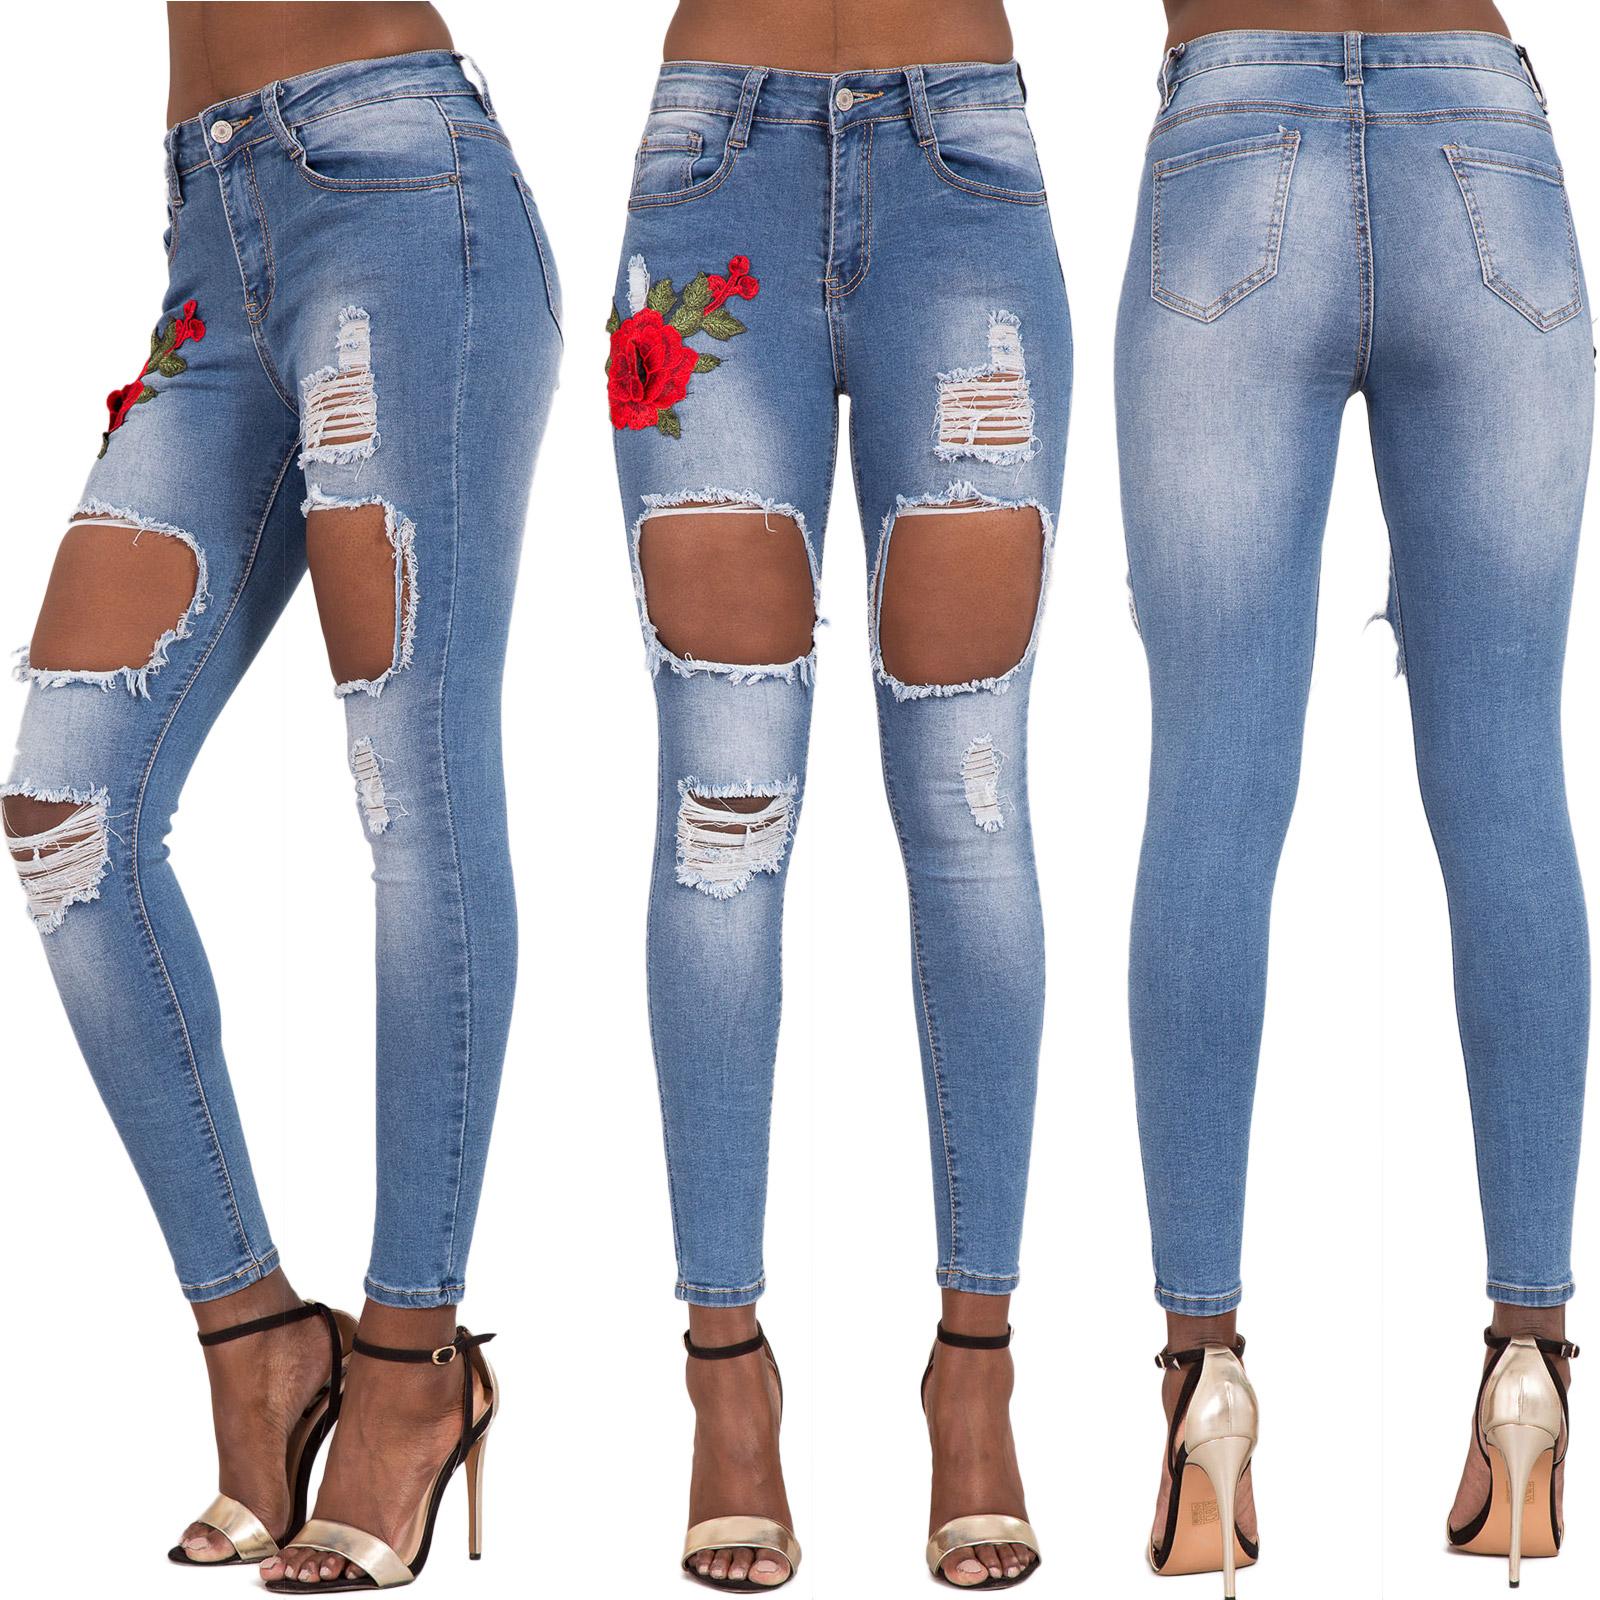 Womens Ripped Knee Skinny Jeans Faded Slim Fit Ladies Denim Size 6 8 10 12 14 16 | eBay